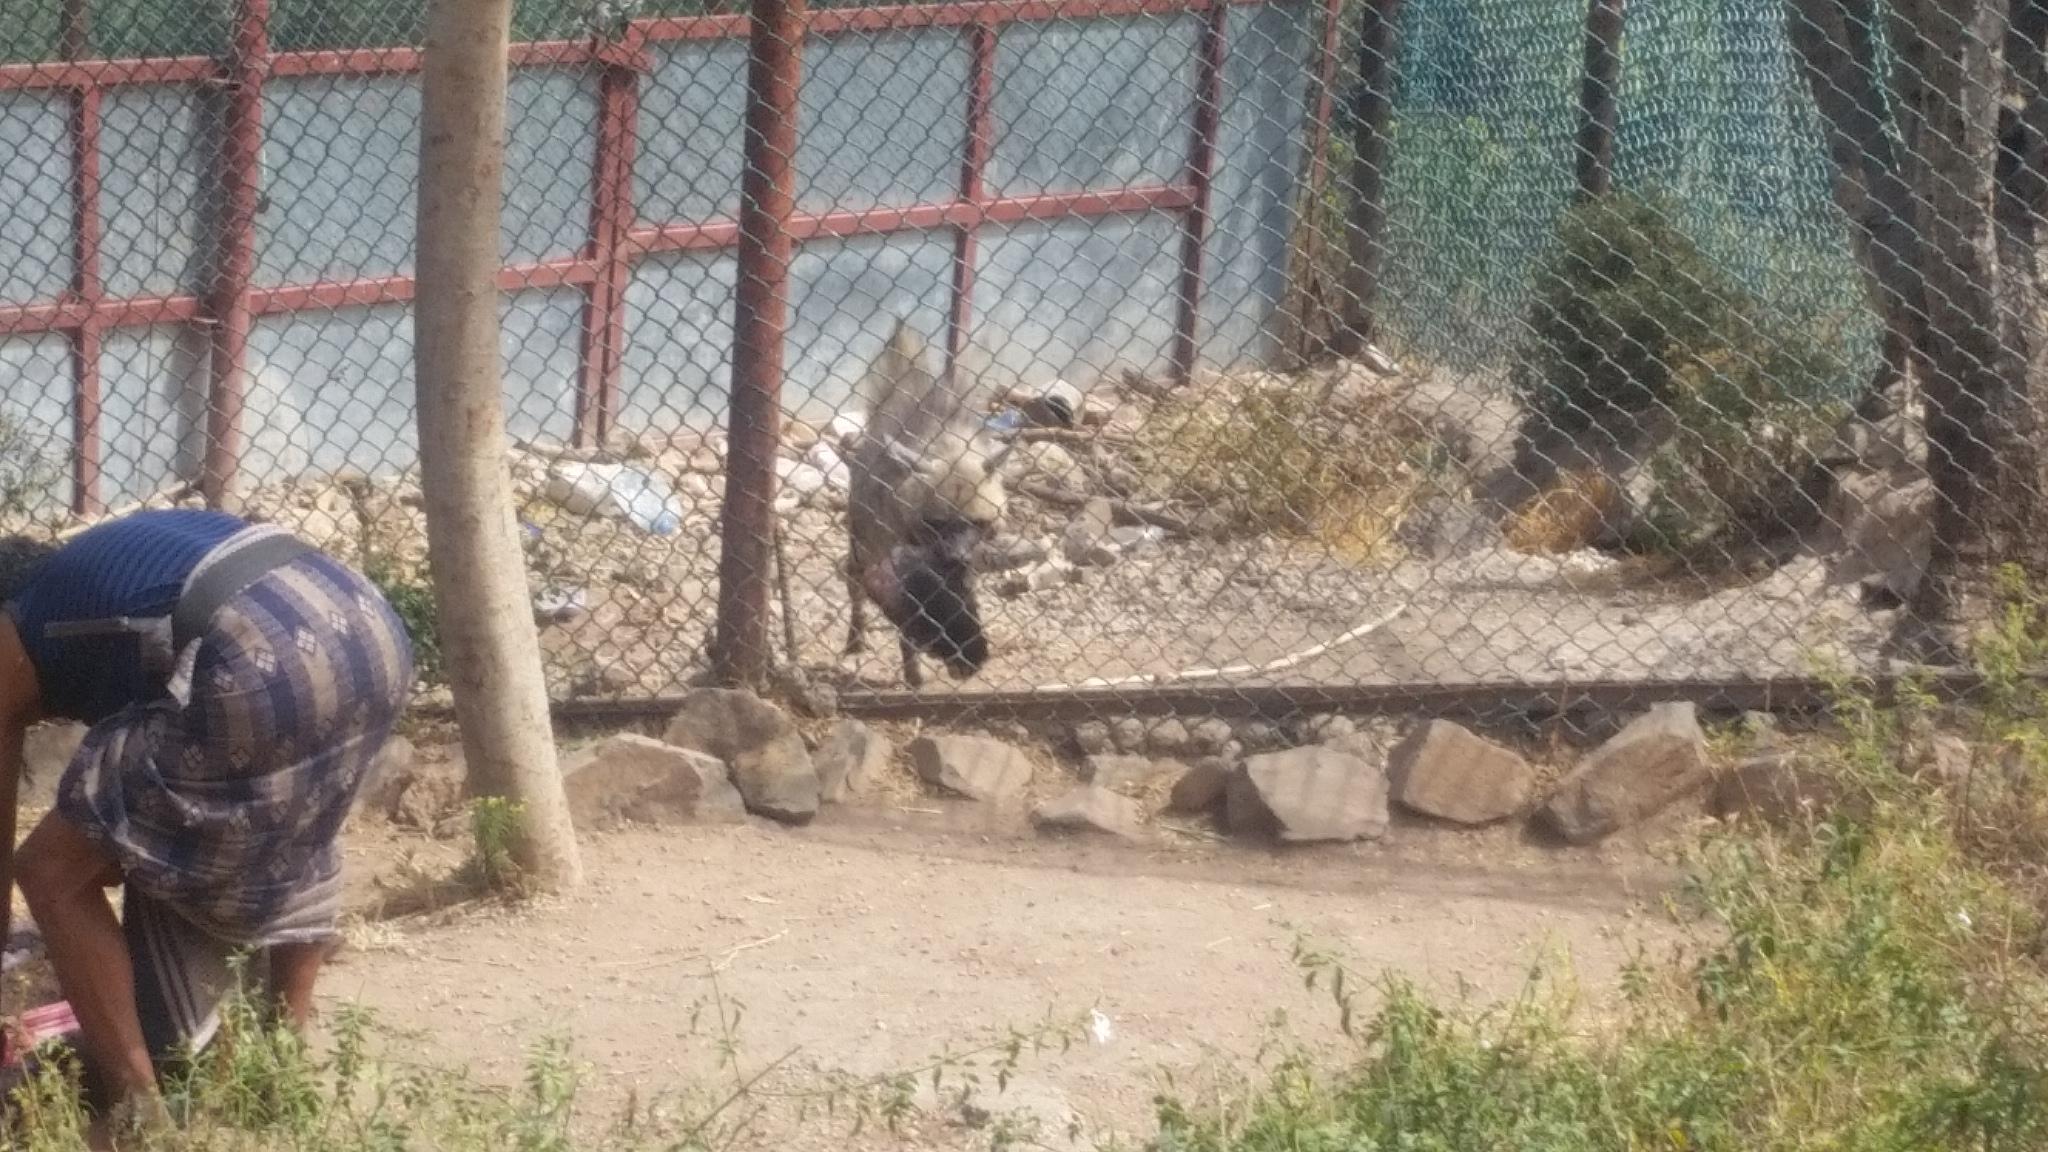 IBB ZOO hyena gets food too 7 nov 2018 butcher being paid 5000Rials by OWAPAR yemen rescue.jpg